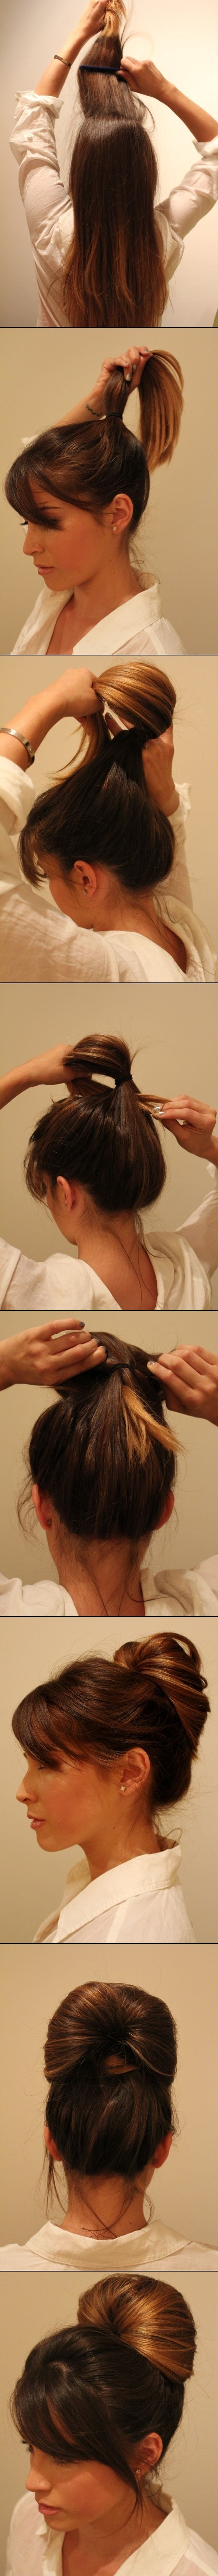 Simple Teased Updo Hairstyle Tutorial